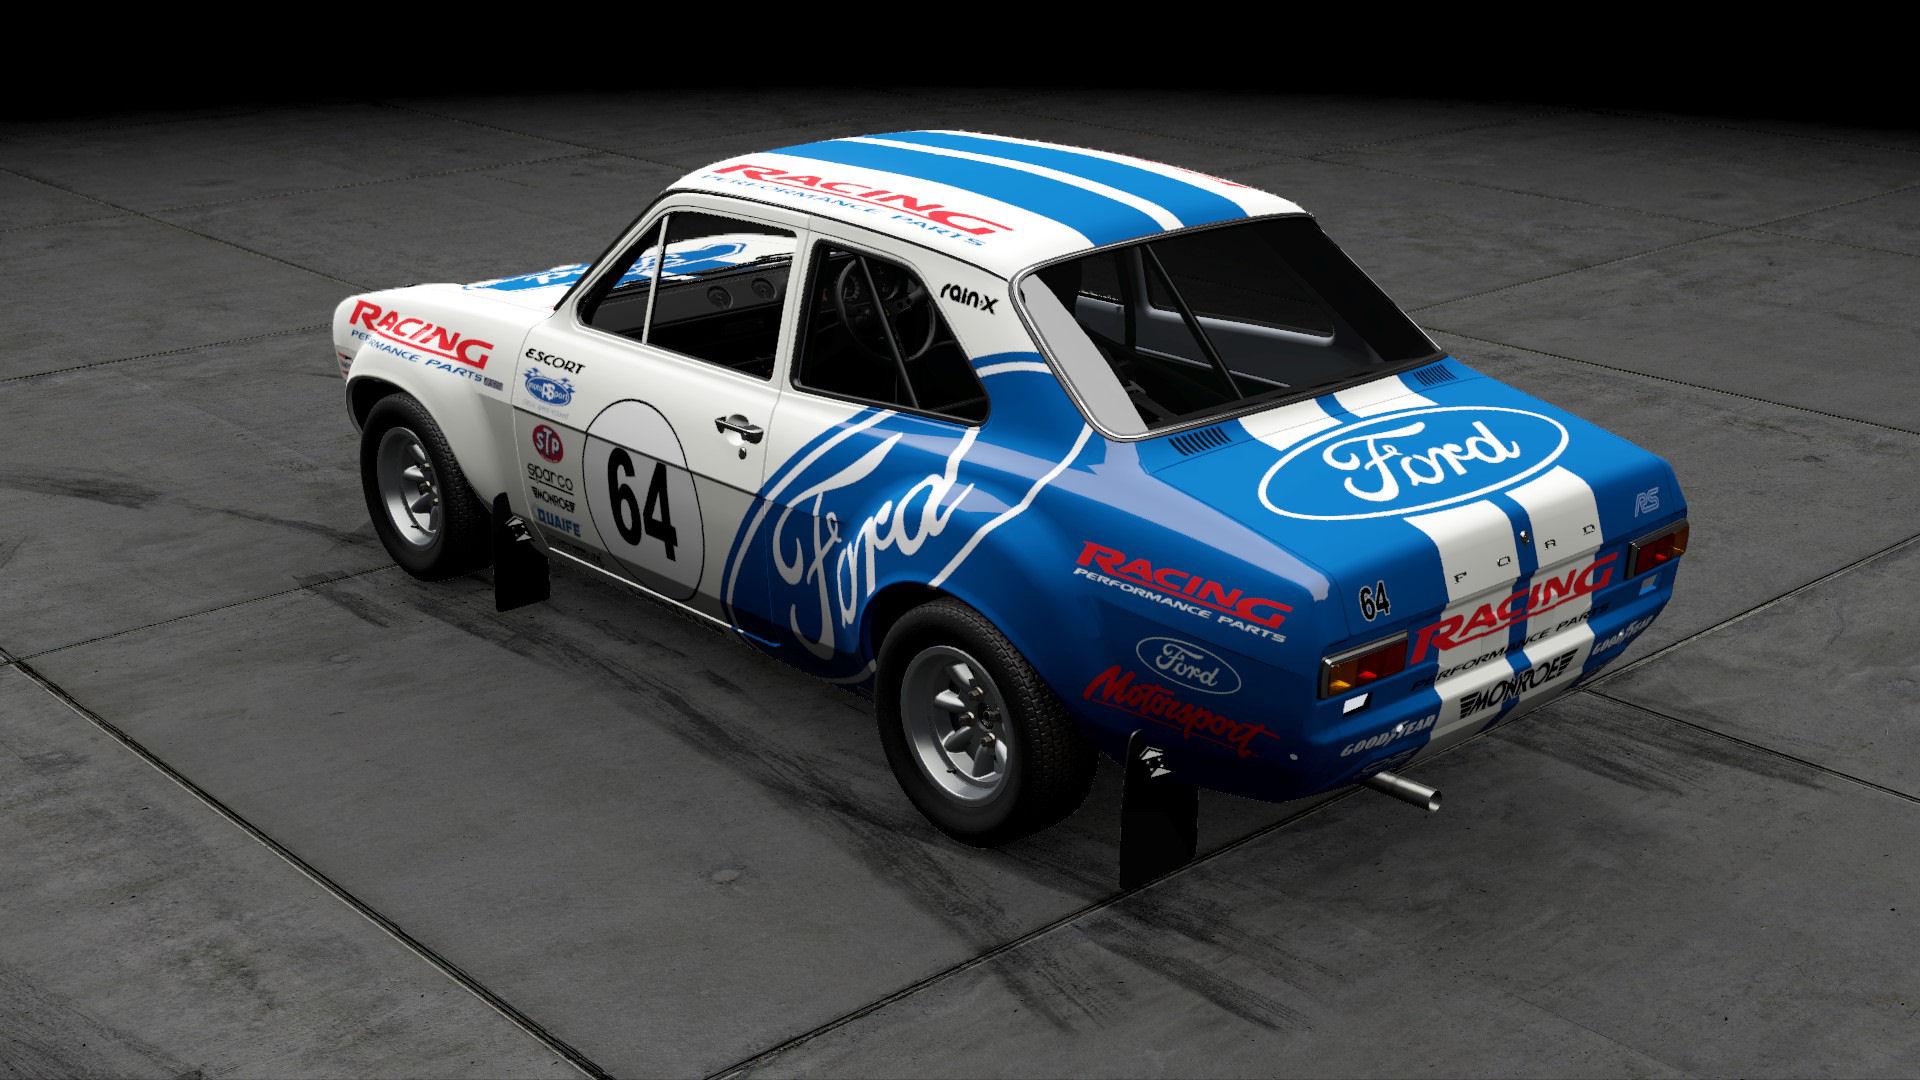 Ford Escort mk1 rx Racing Performance Parts 03.jpg